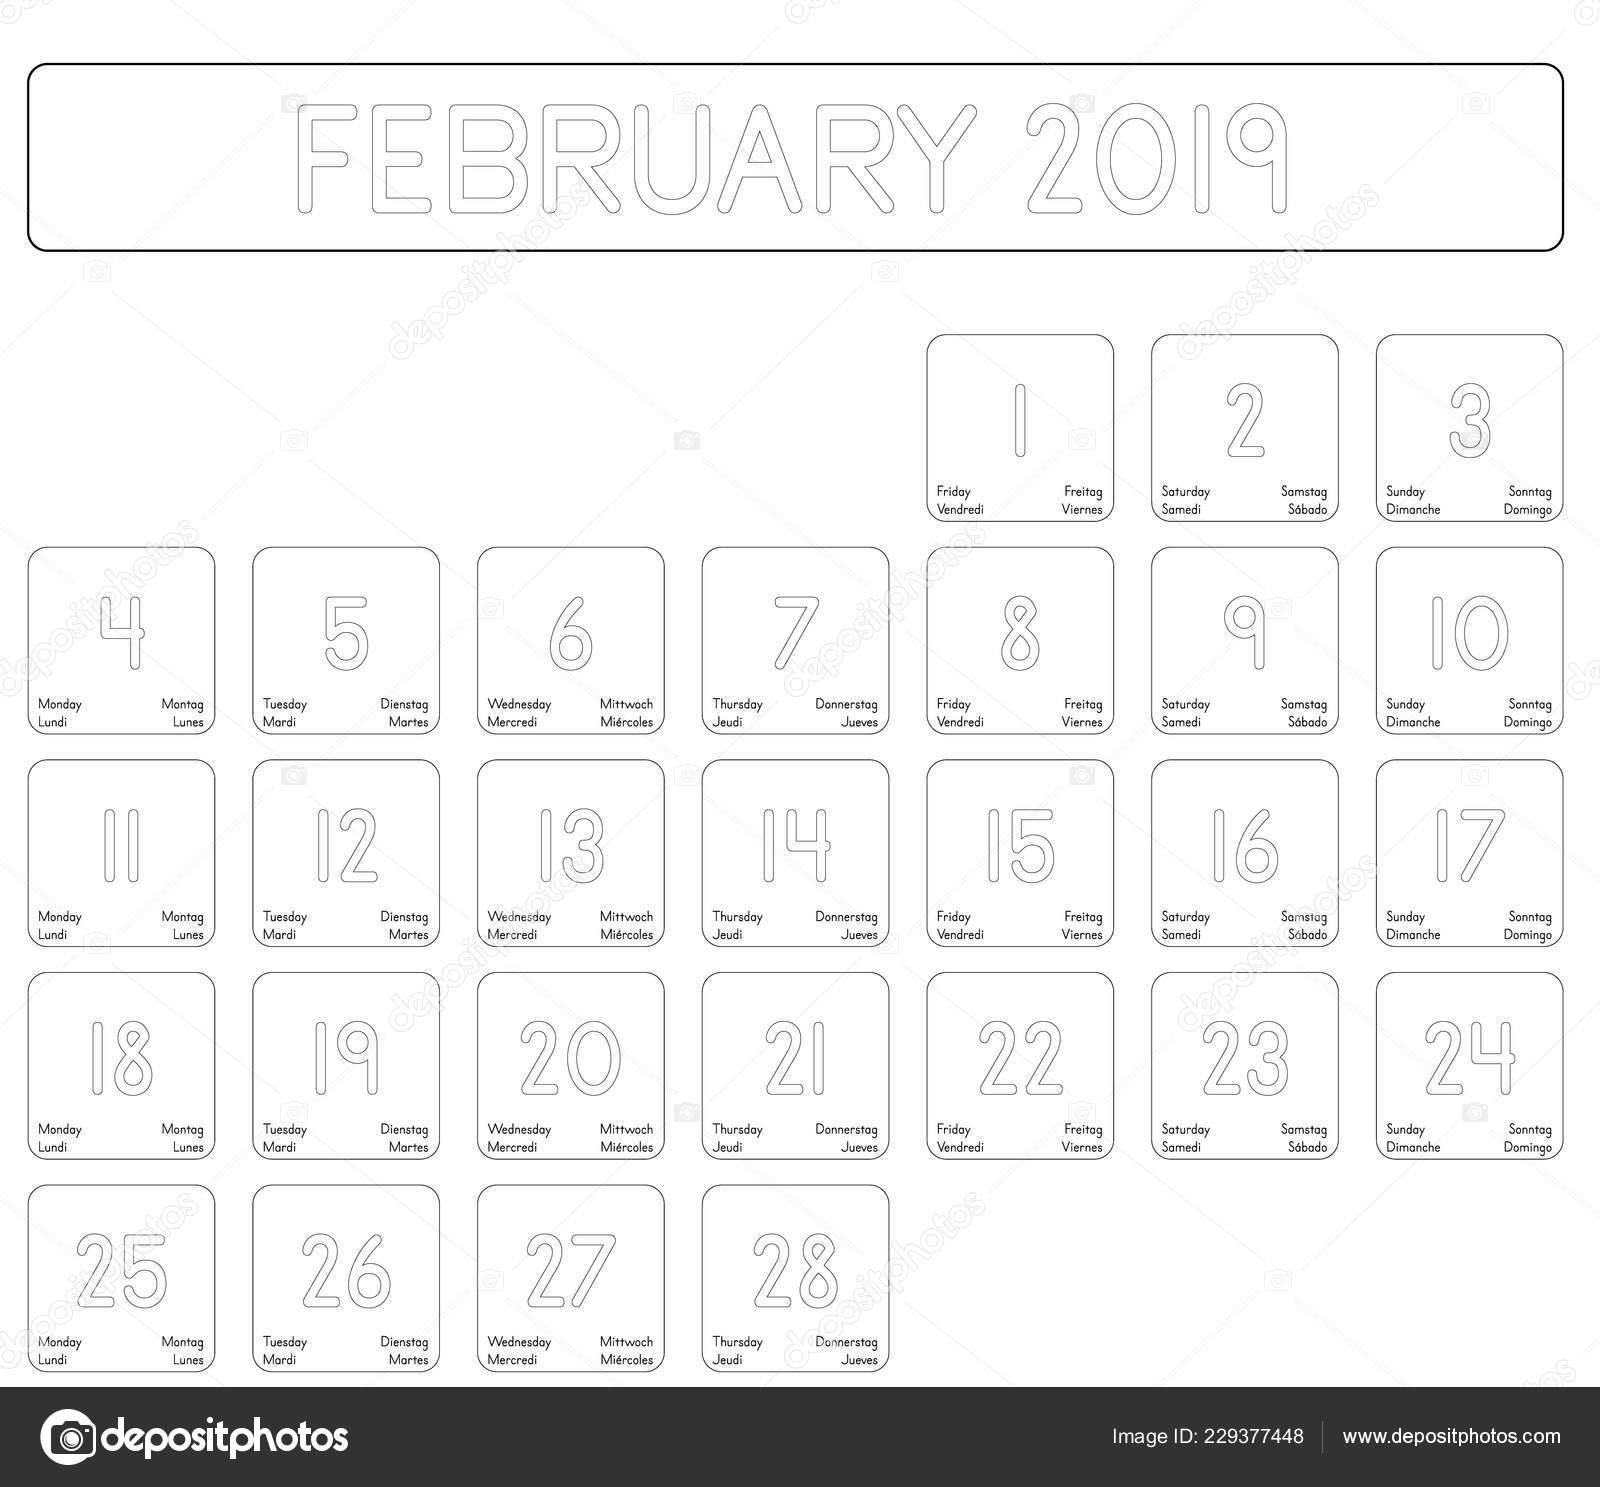 Calendario Diario 2019.Detallado Calendario Diario Del Mes Febrero 2019 Vector De